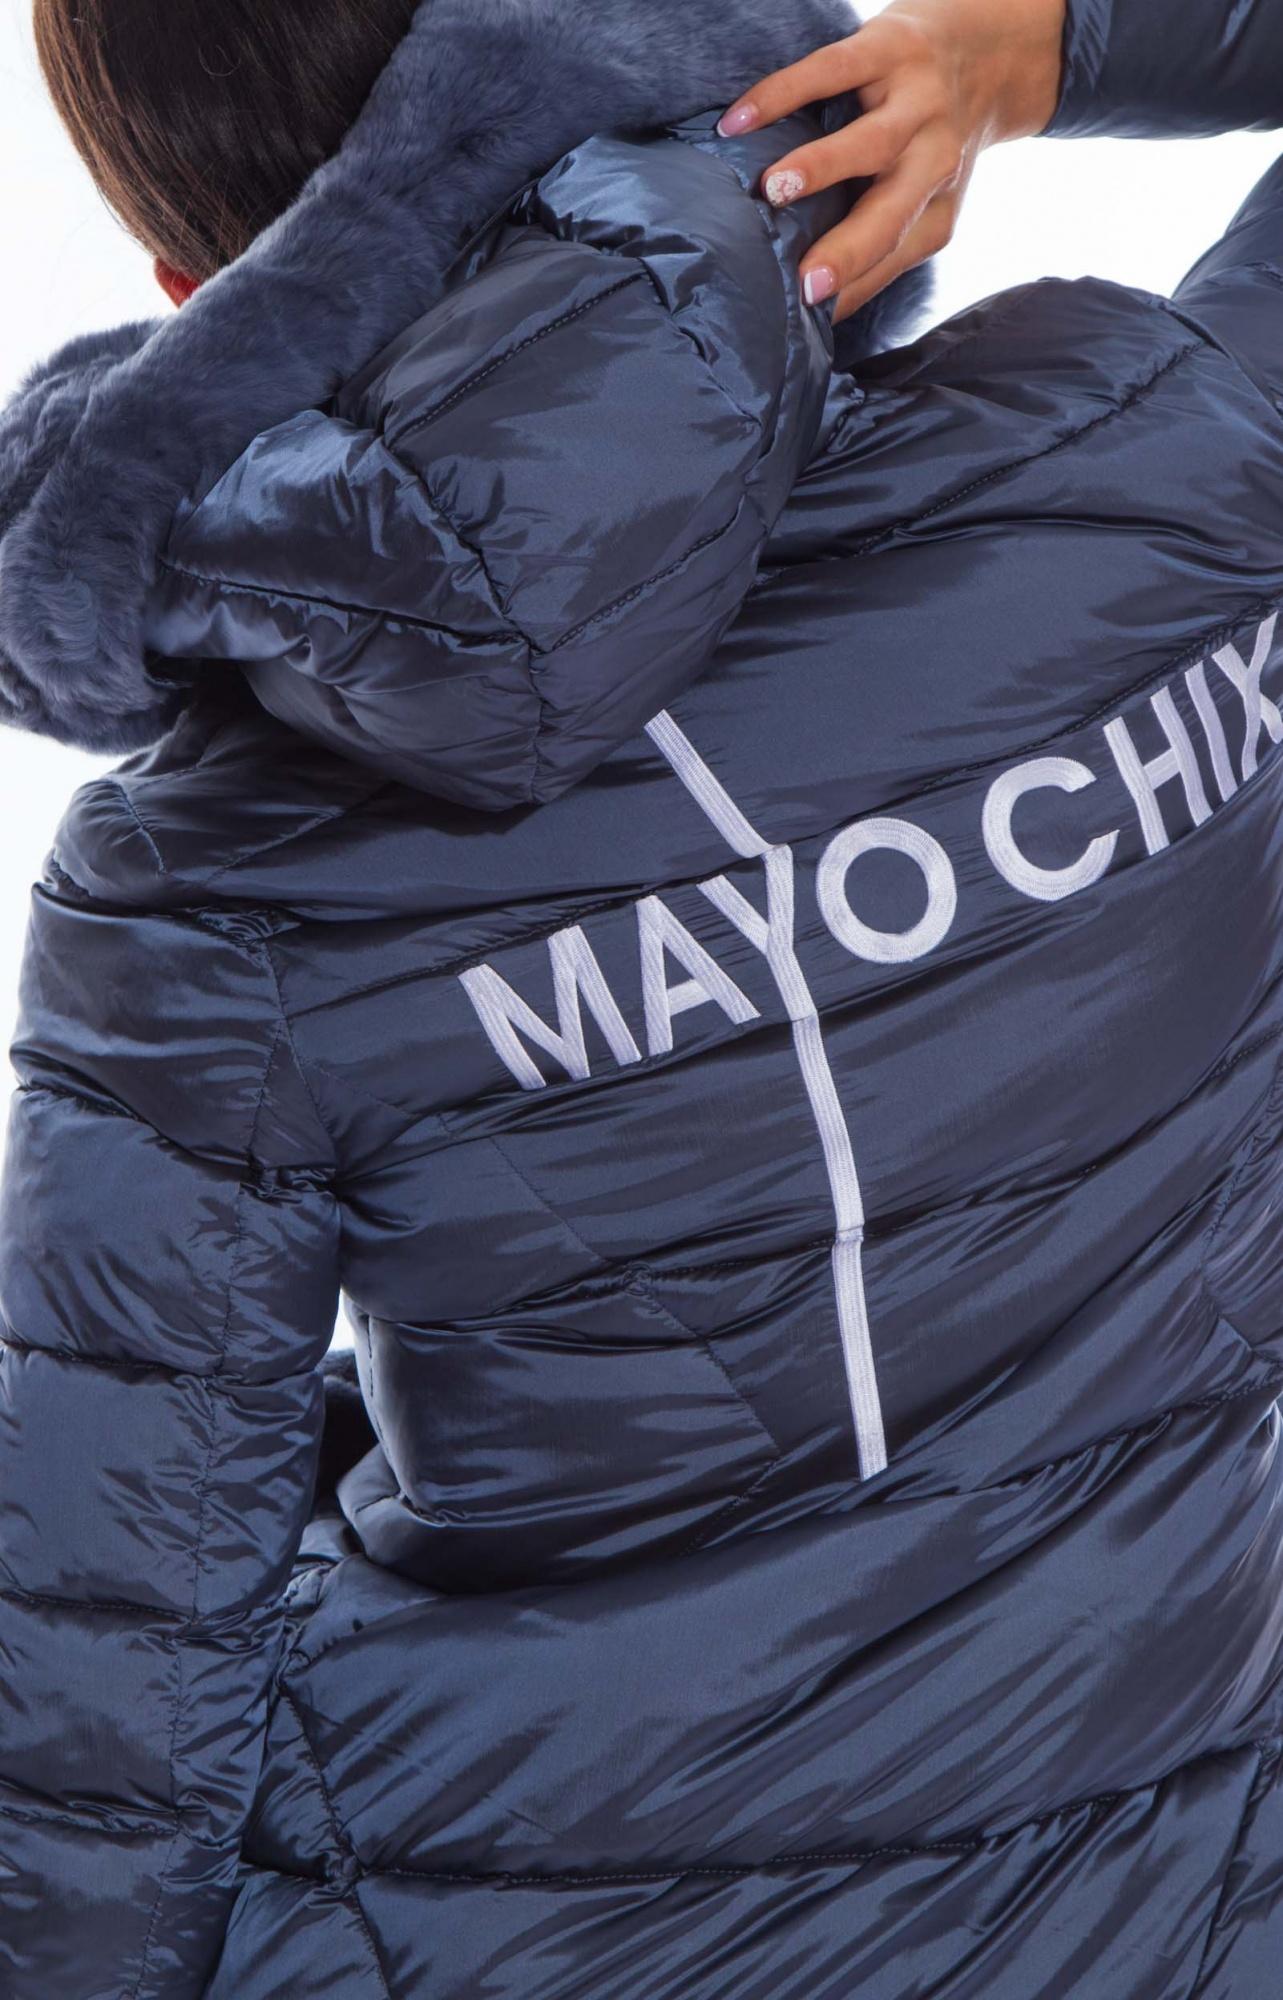 Mayo Chix kabát | Mayo Chix webshop | mayochixplaza.hu